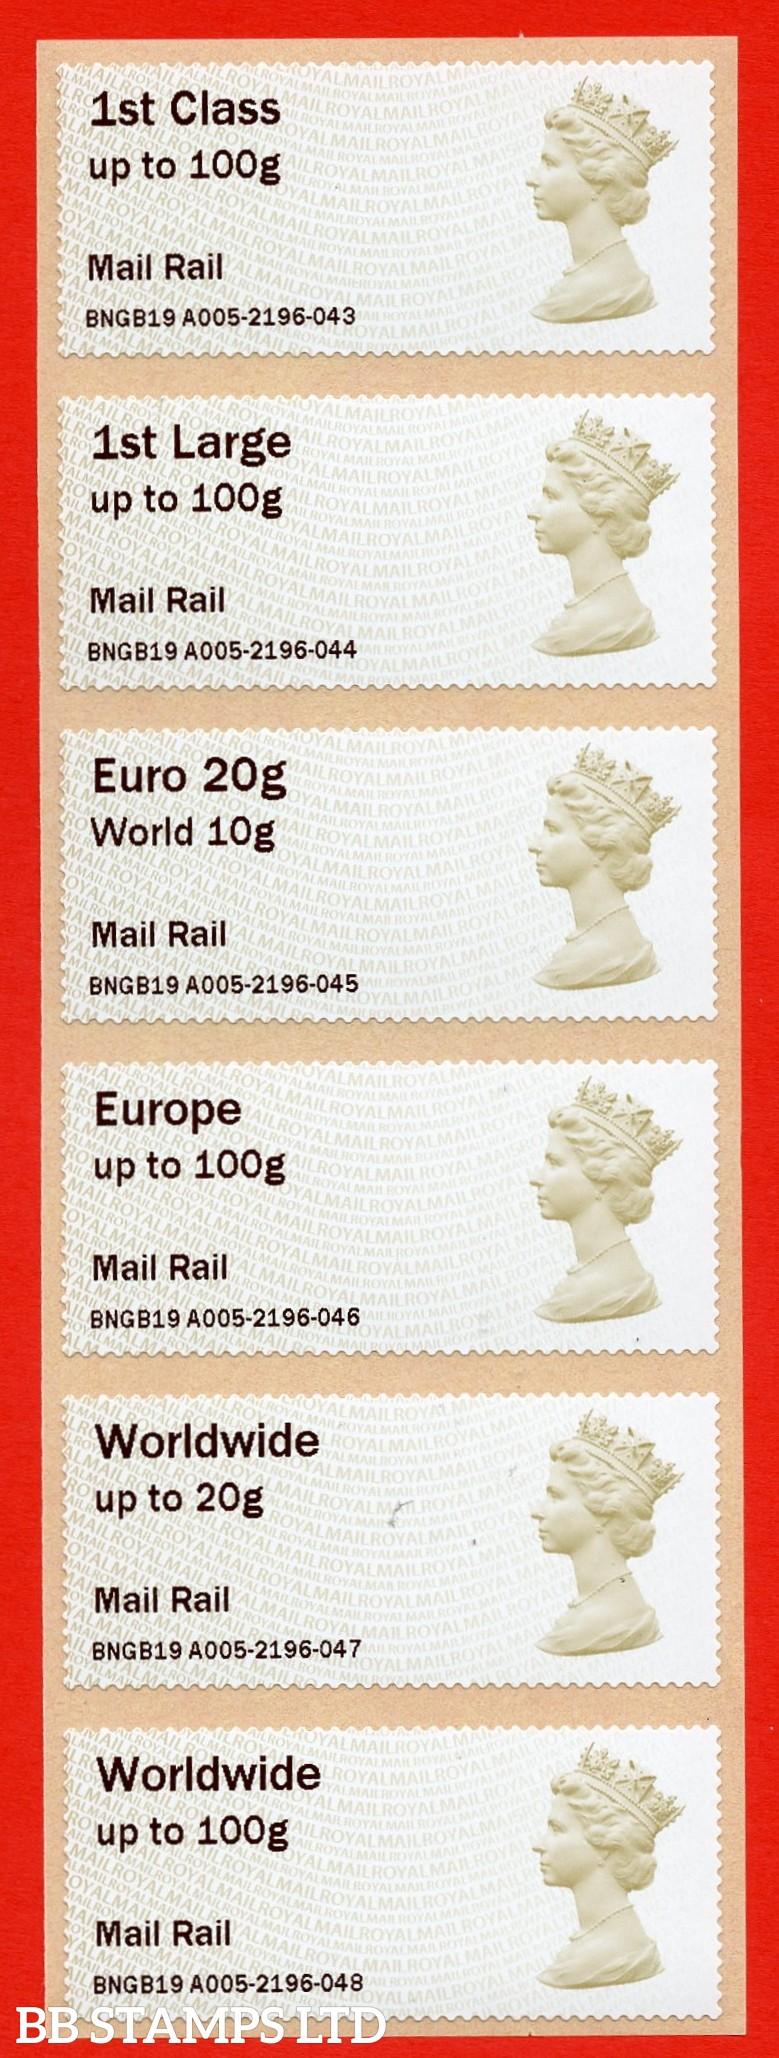 Machin Mail Rail: 1st - W/Wide 100g: MA15 Type IIIA (set of 6) (BK29,P13)